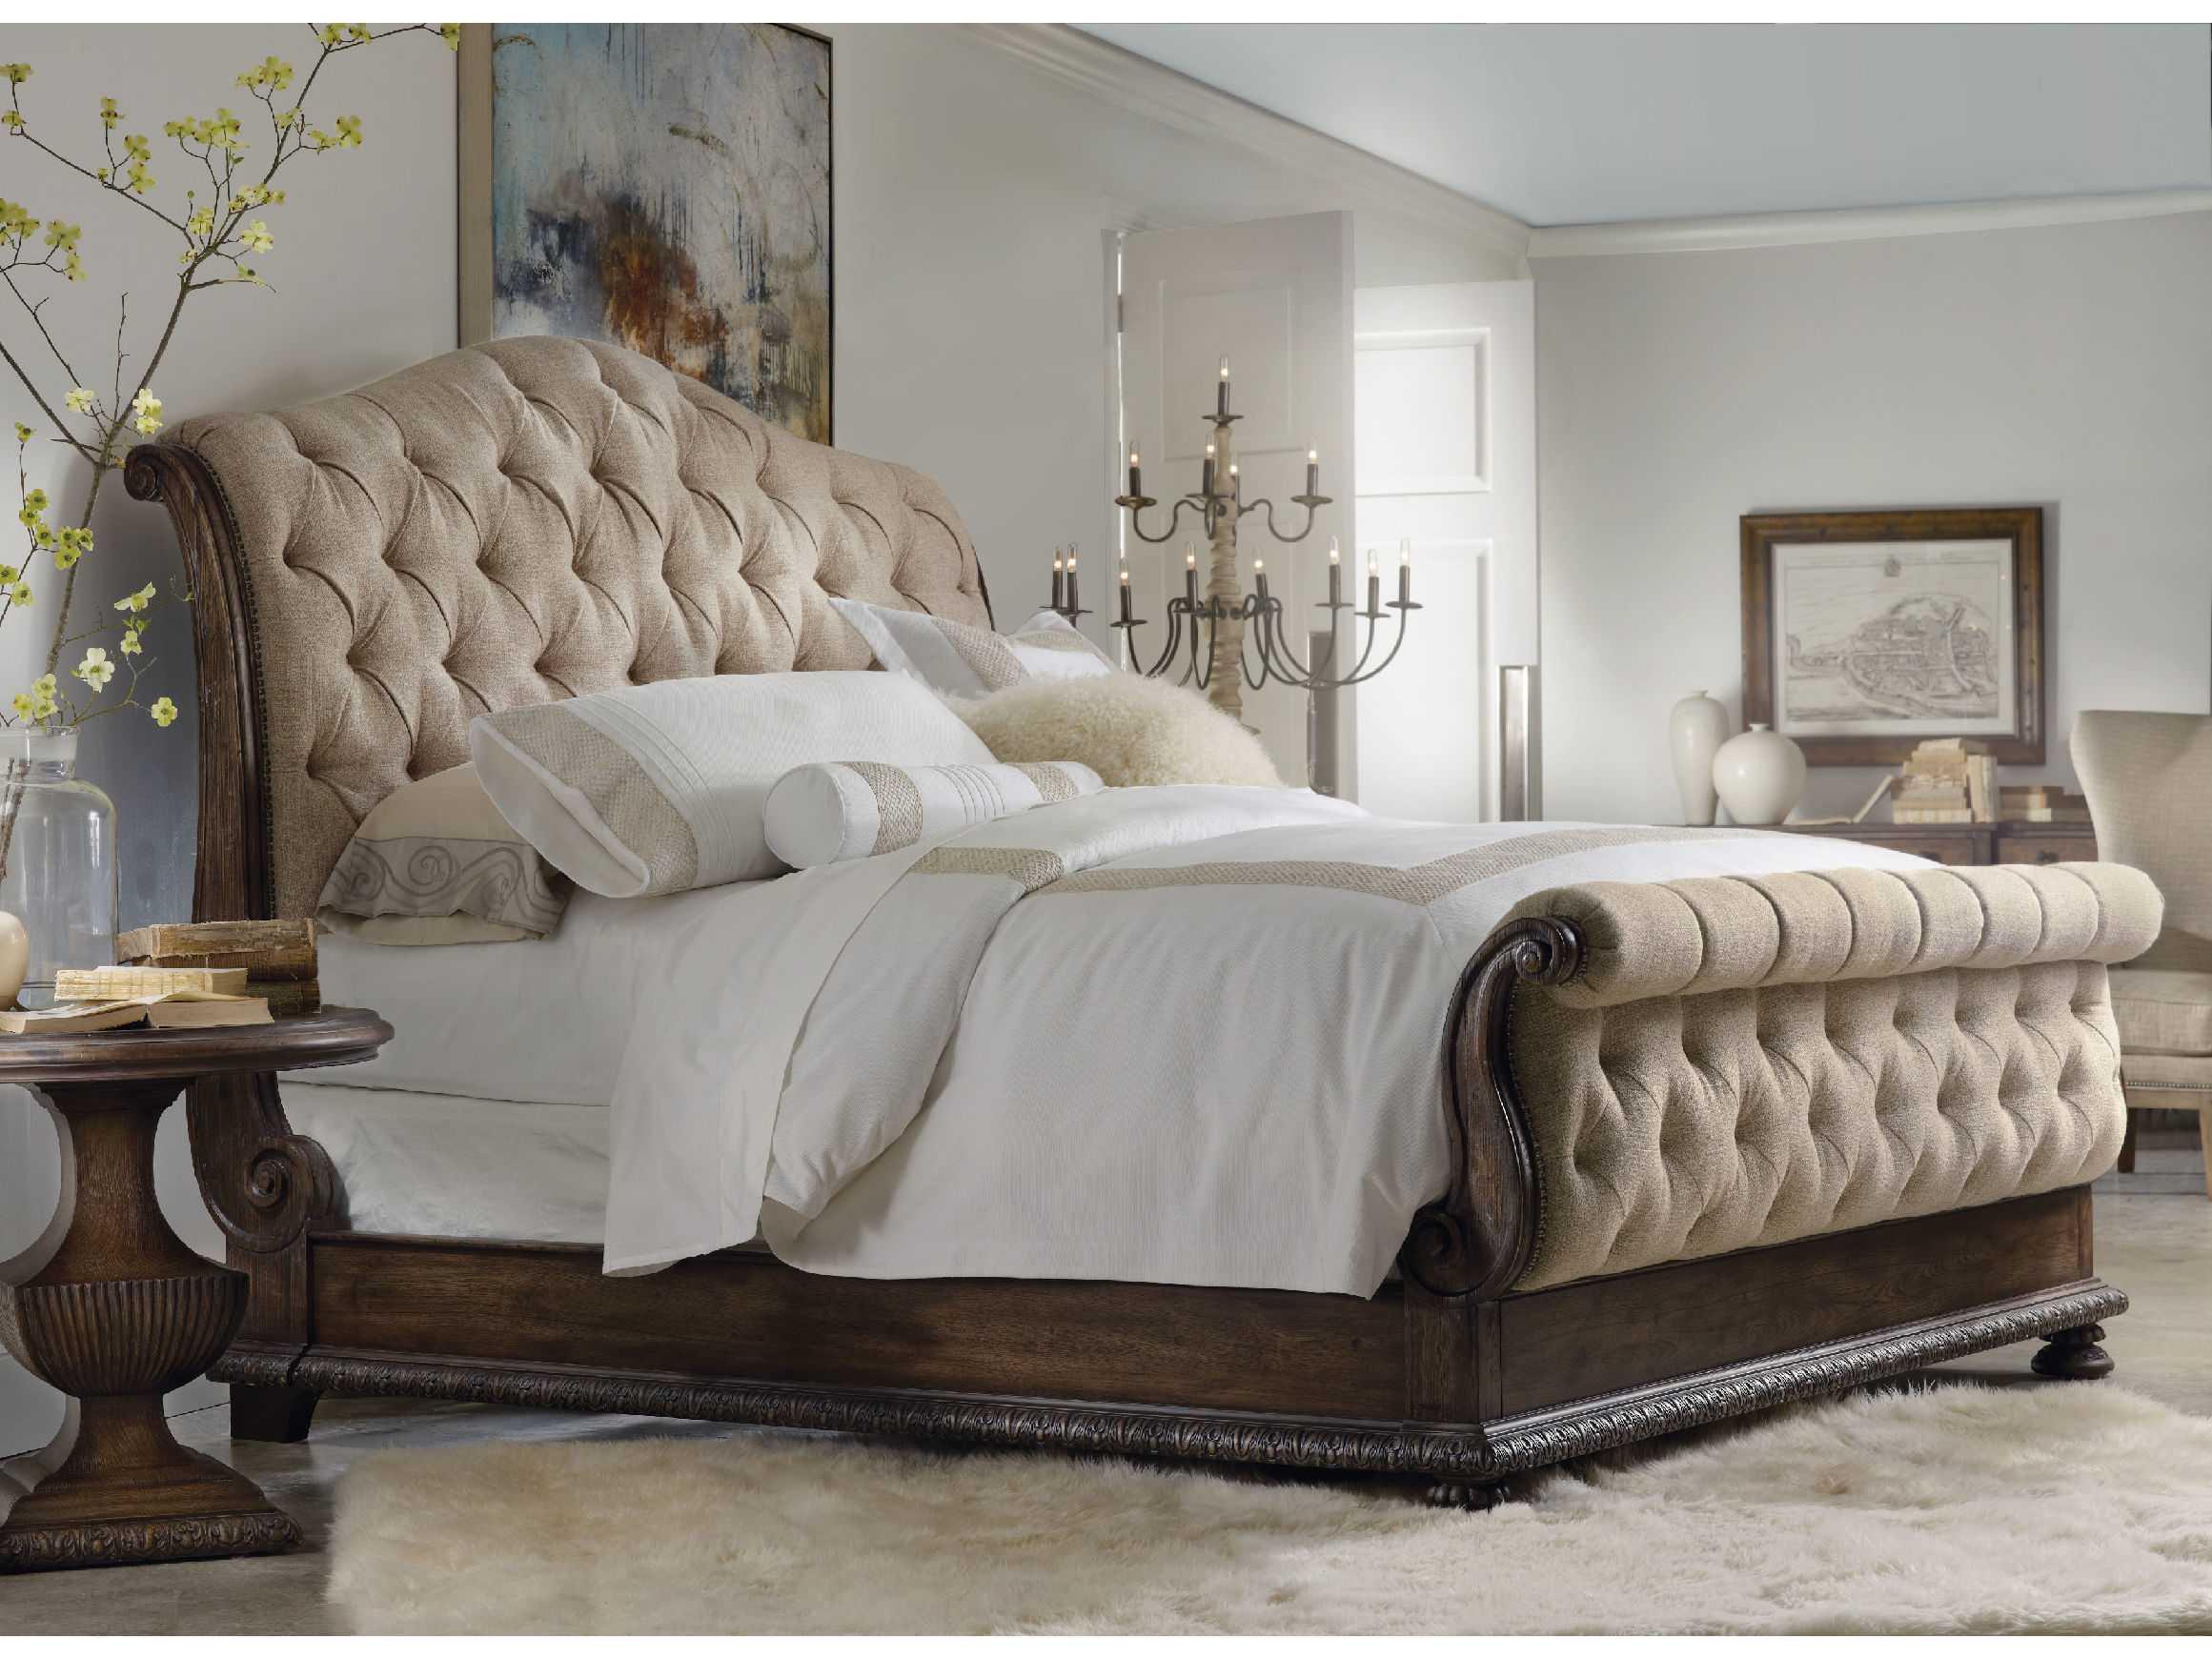 Hooker Furniture Rhapsody Rustic Walnut King Size Tufted Sleigh